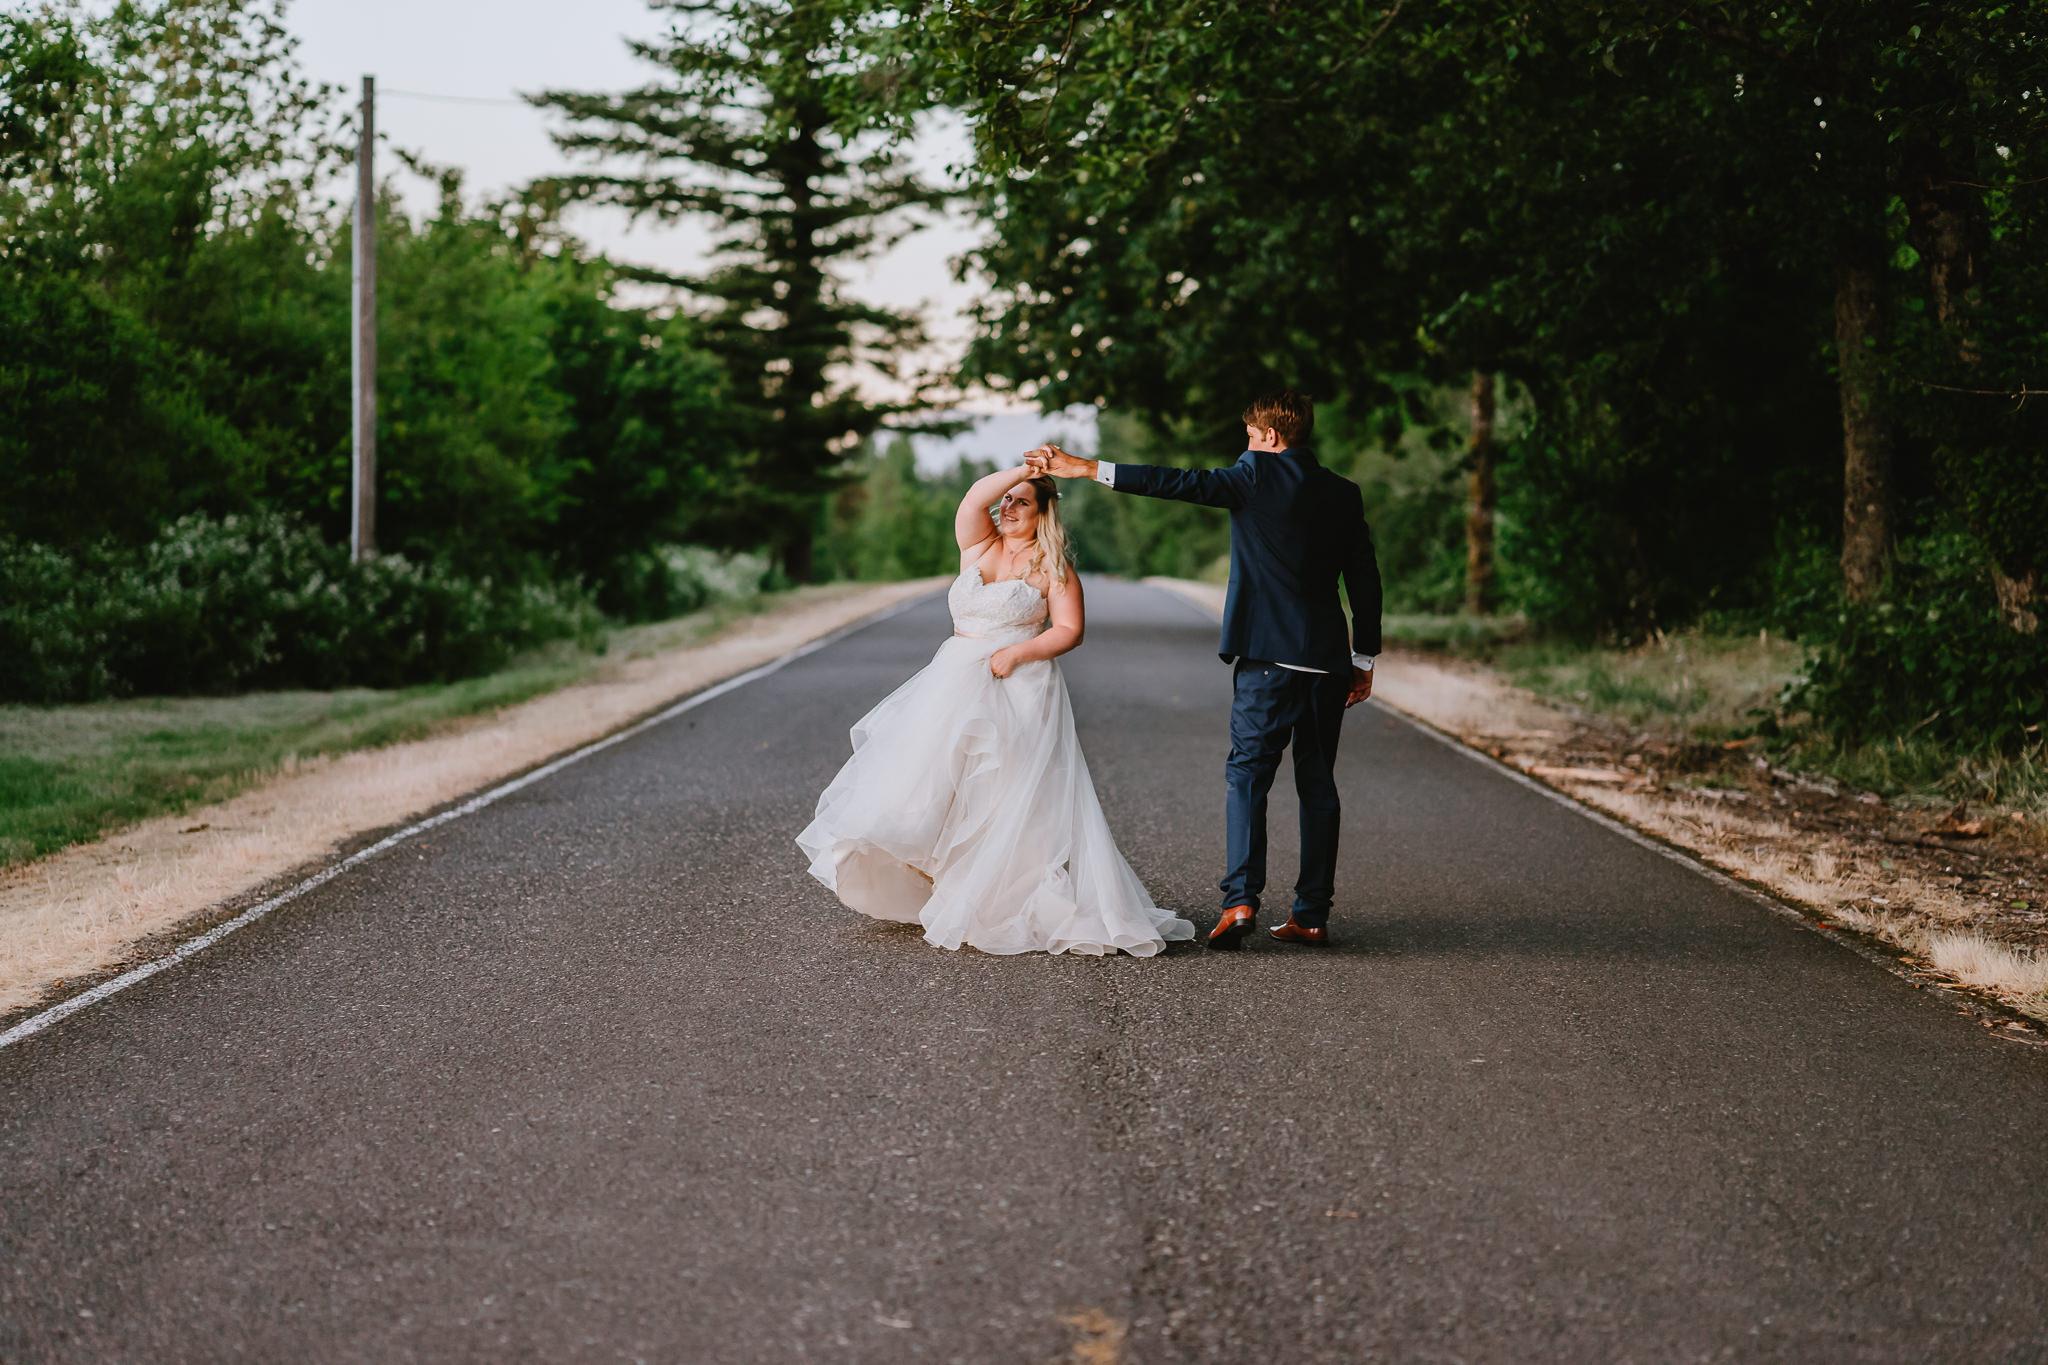 Groom twirl bride dress flow sunset Portland Oregon Wedding Photographer Alfred Tang